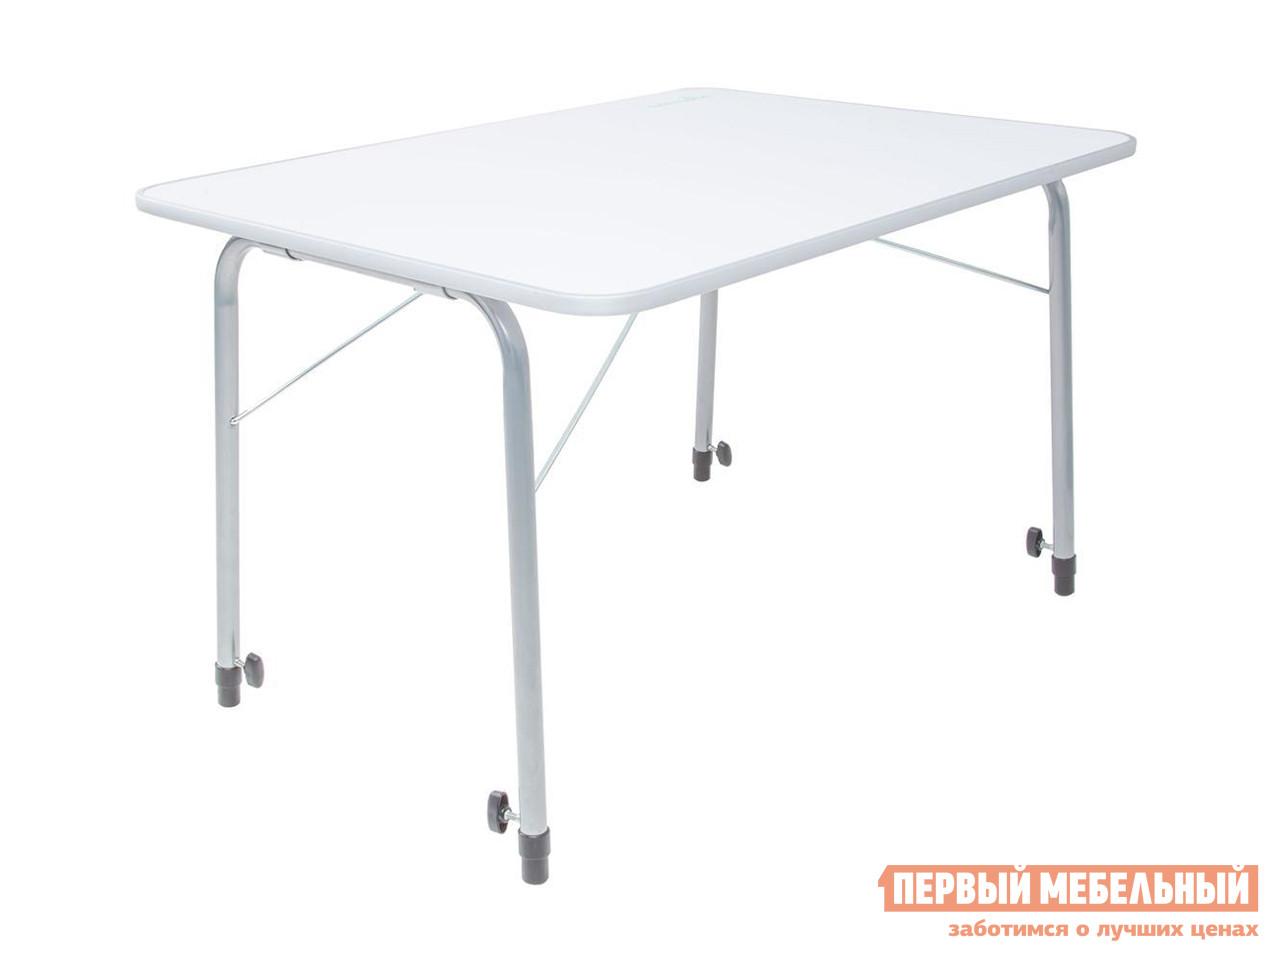 Стол для пикника Лекс групп Стол M5601